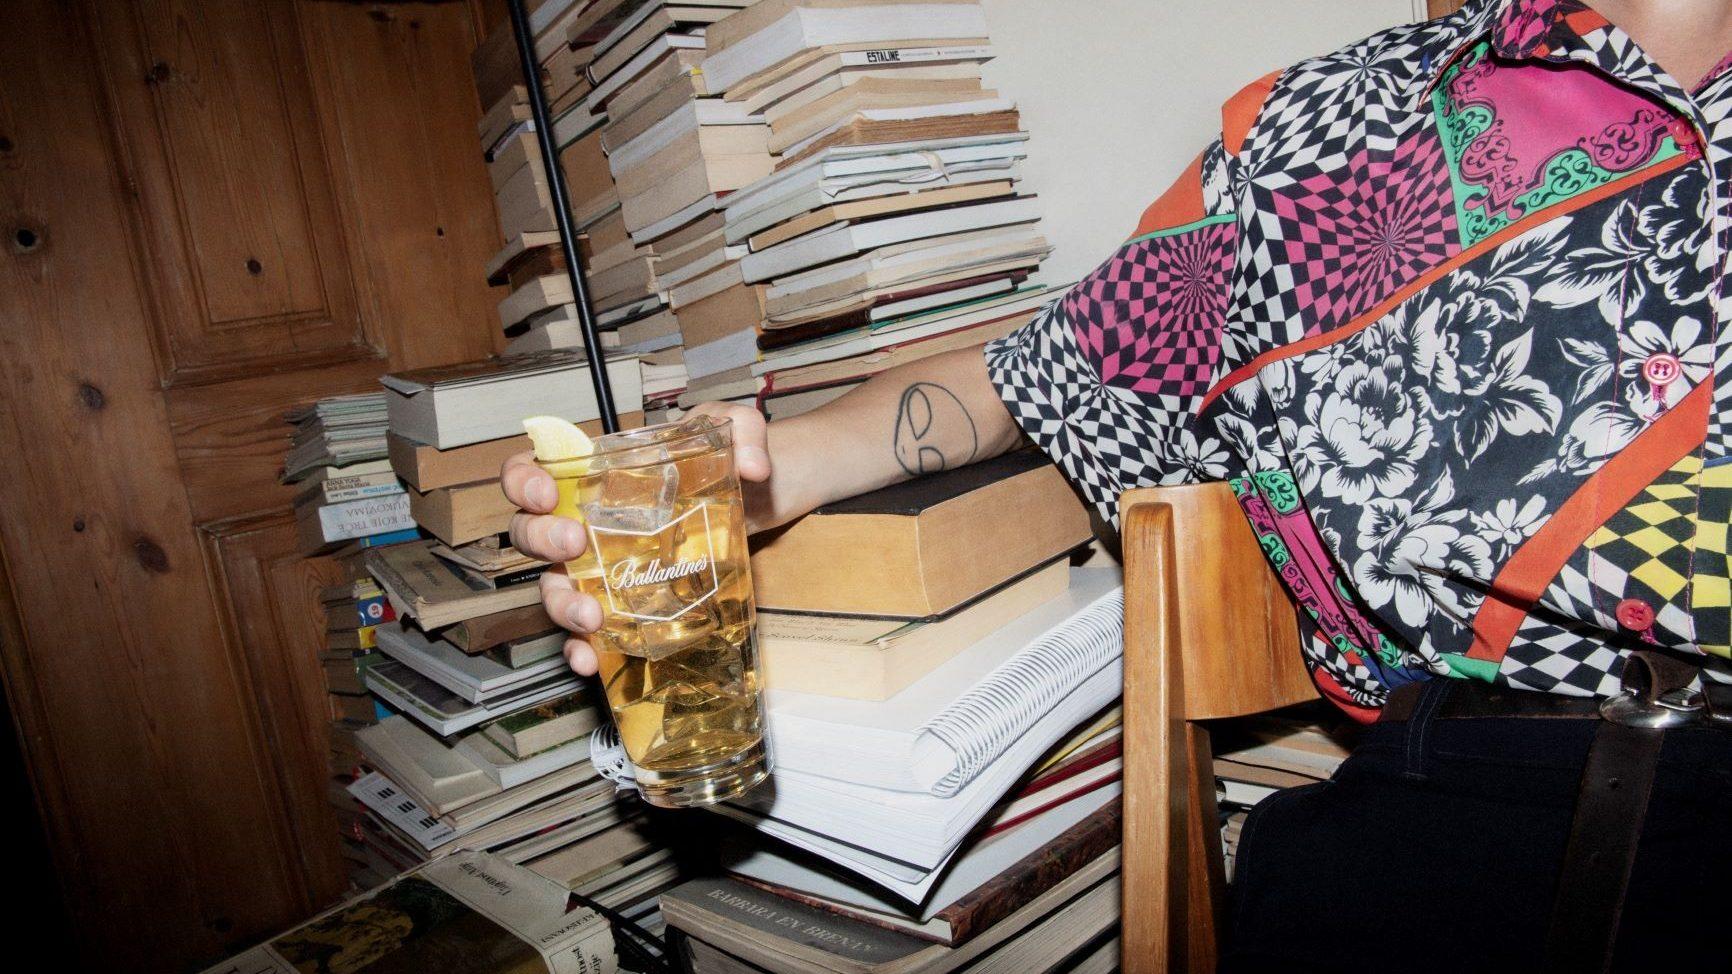 ballantines finest scotch whisky blog news page aspect ratio 16 9